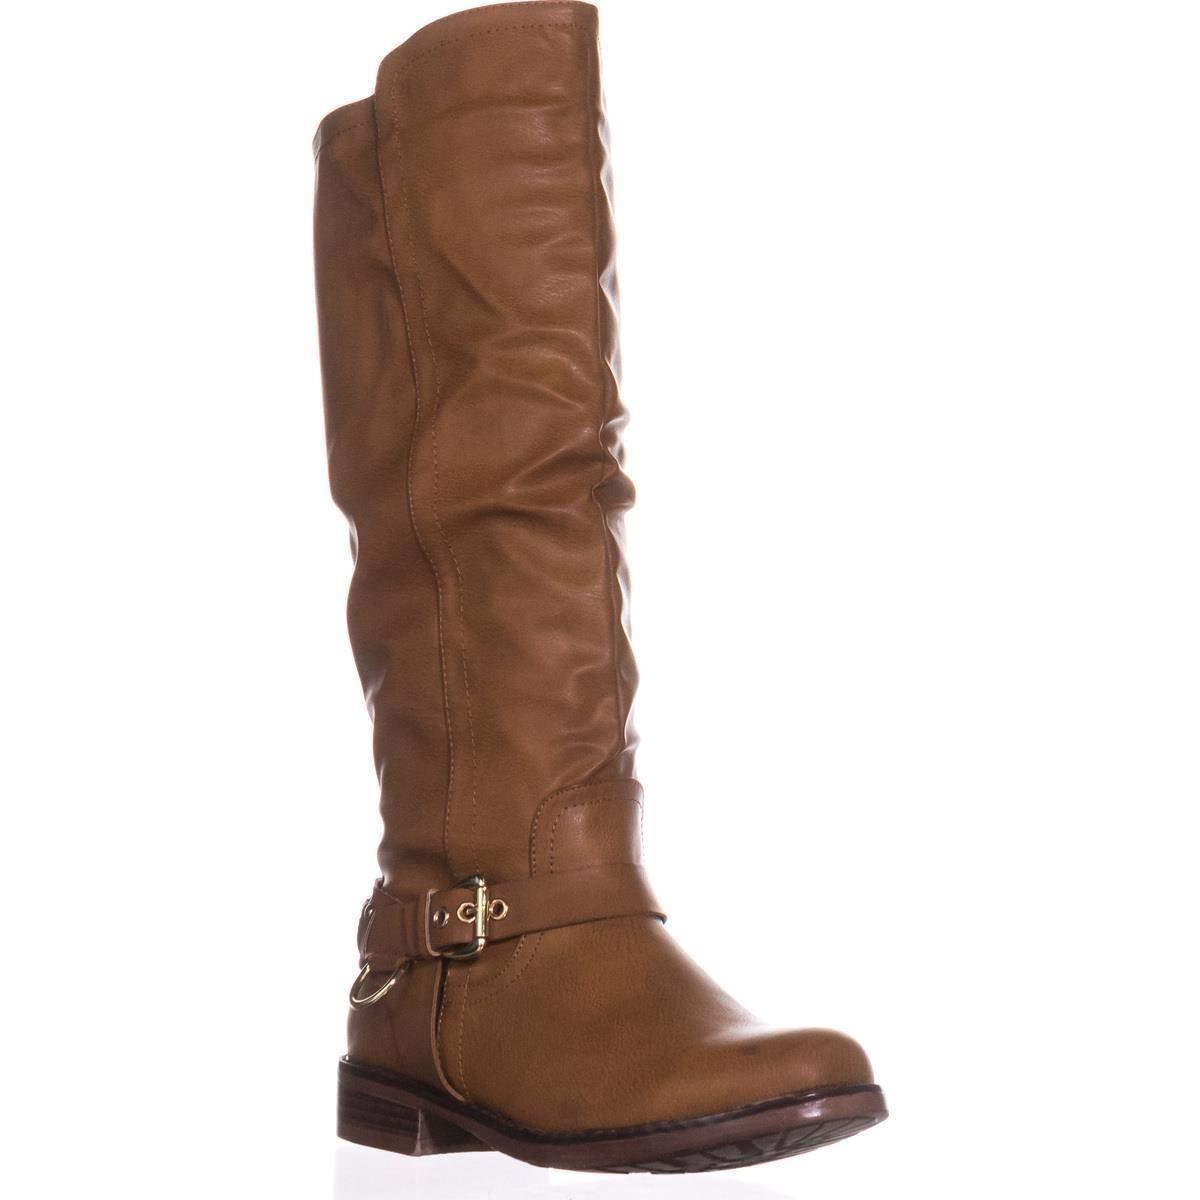 cba0a874912a XOXO Mauricia Tall Riding Boots